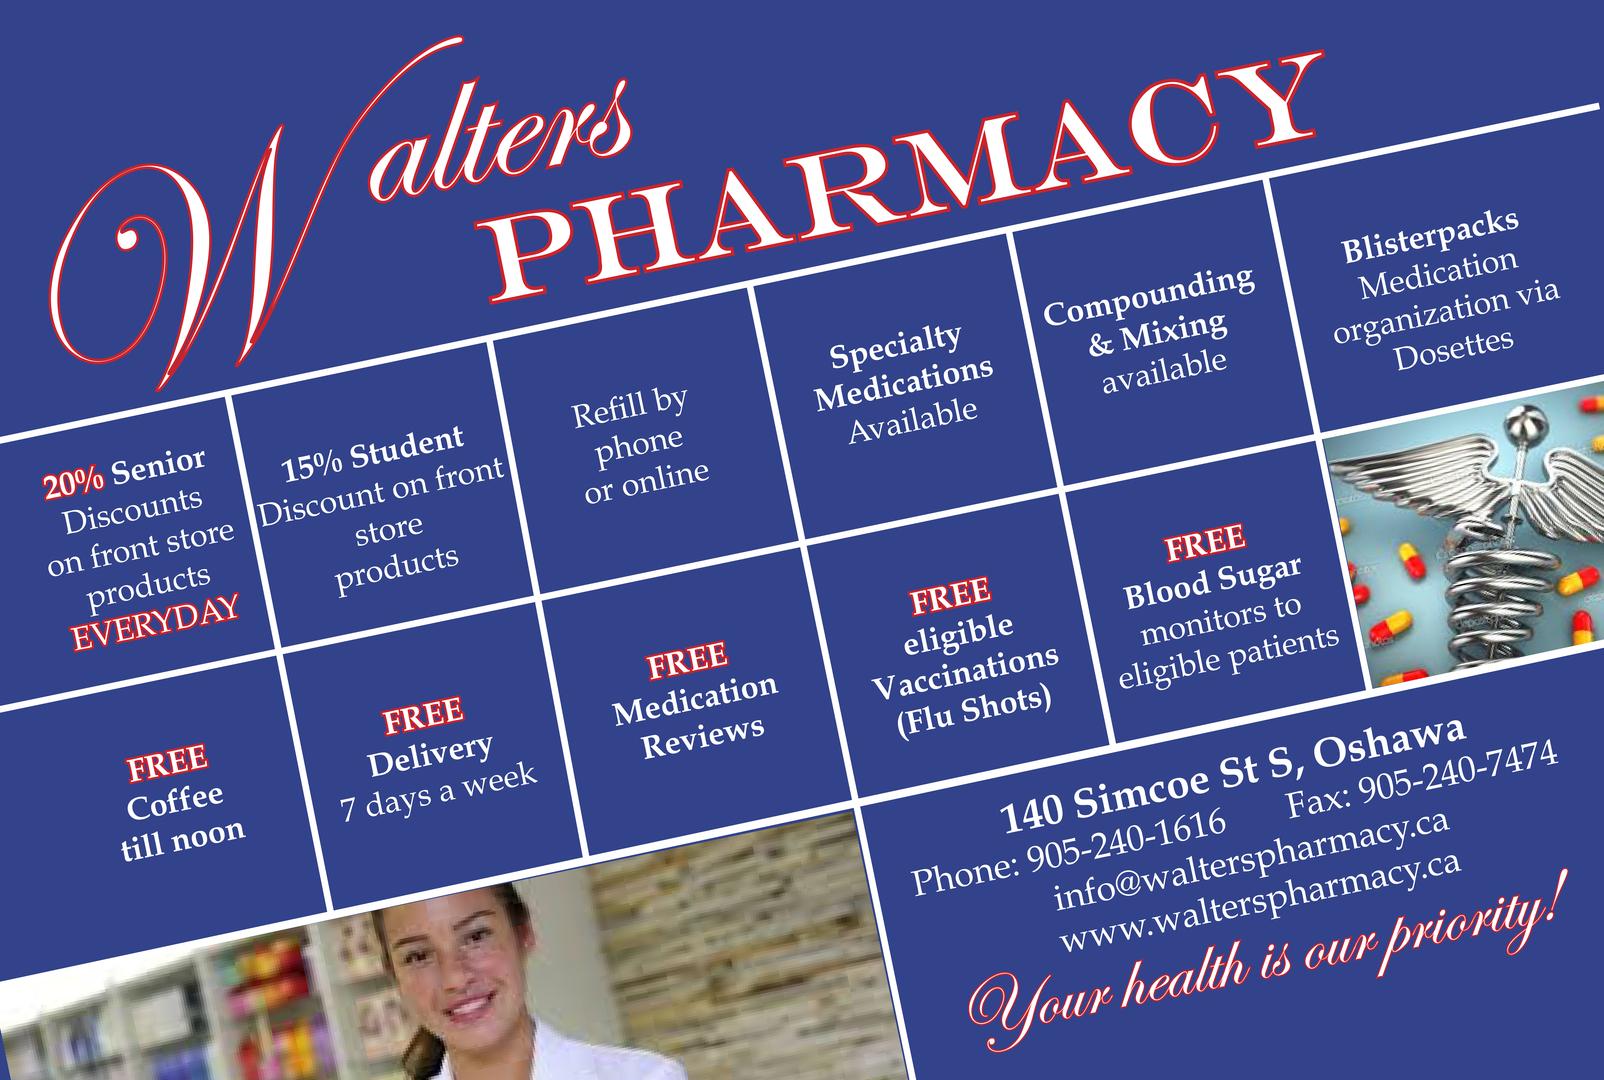 Walters Pharmacy